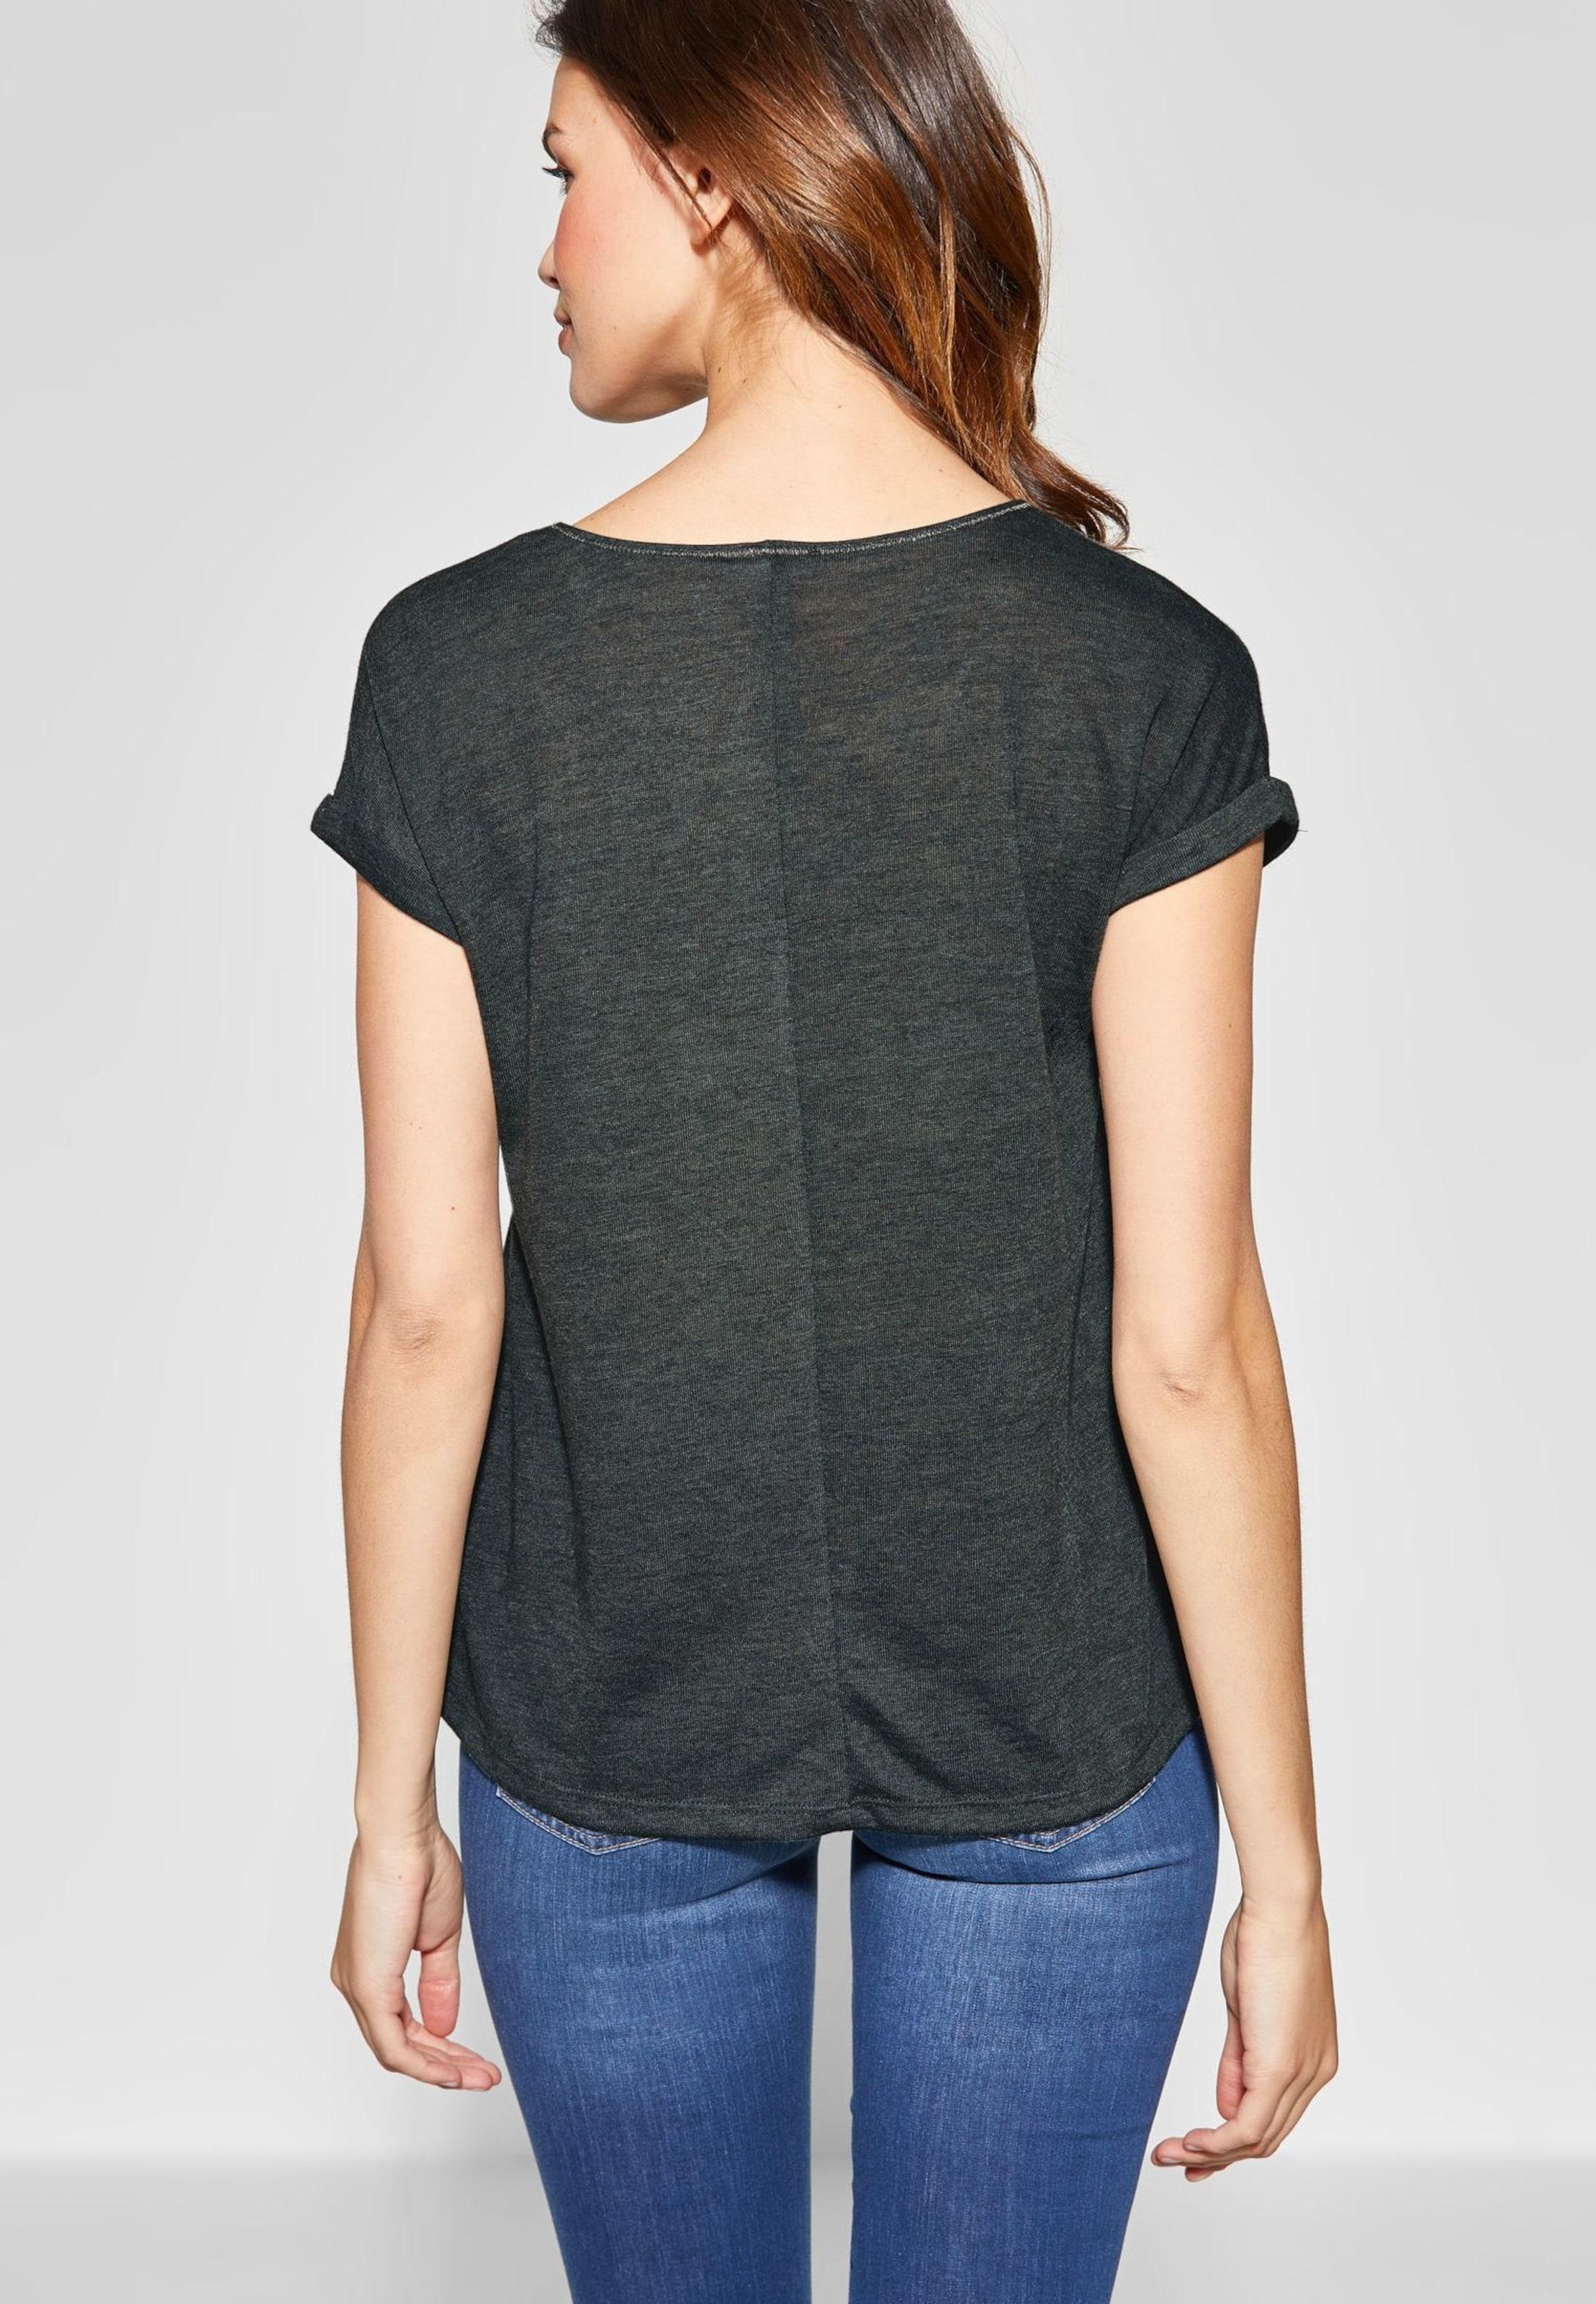 Wordingprint Street Lockeres Shirt Grün In One Ybyfg76